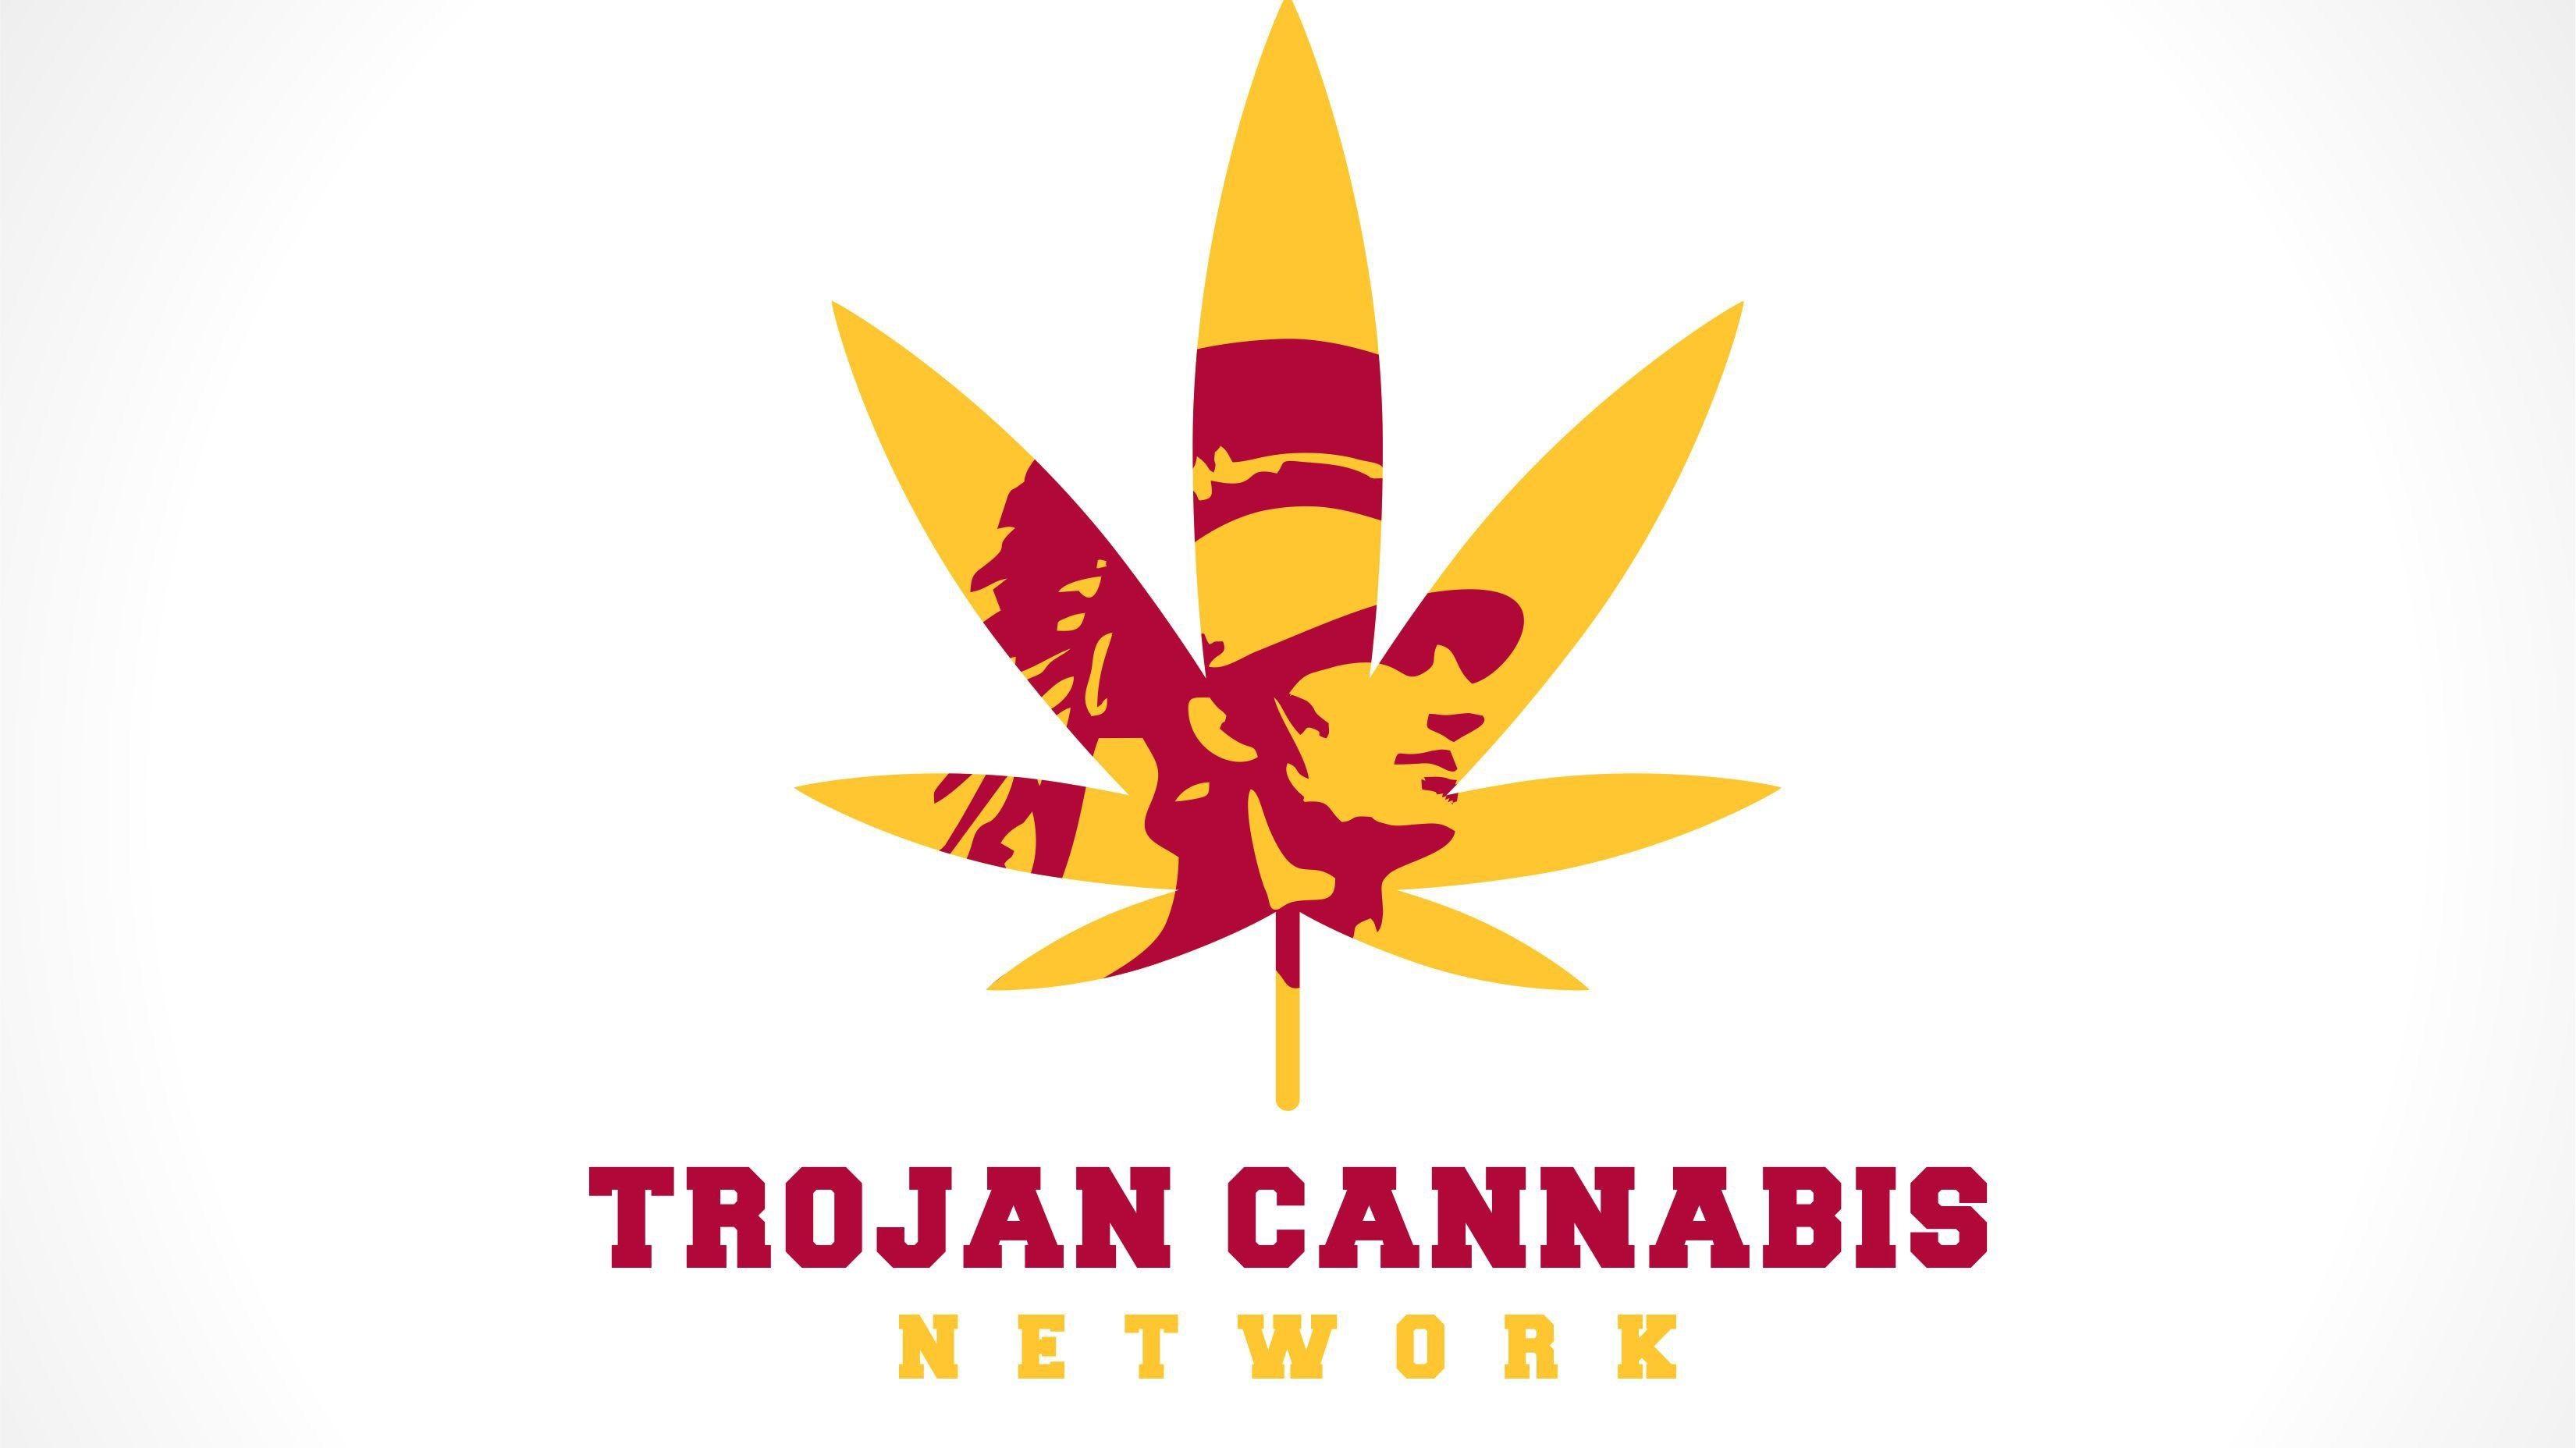 Trojan Cannabis Network